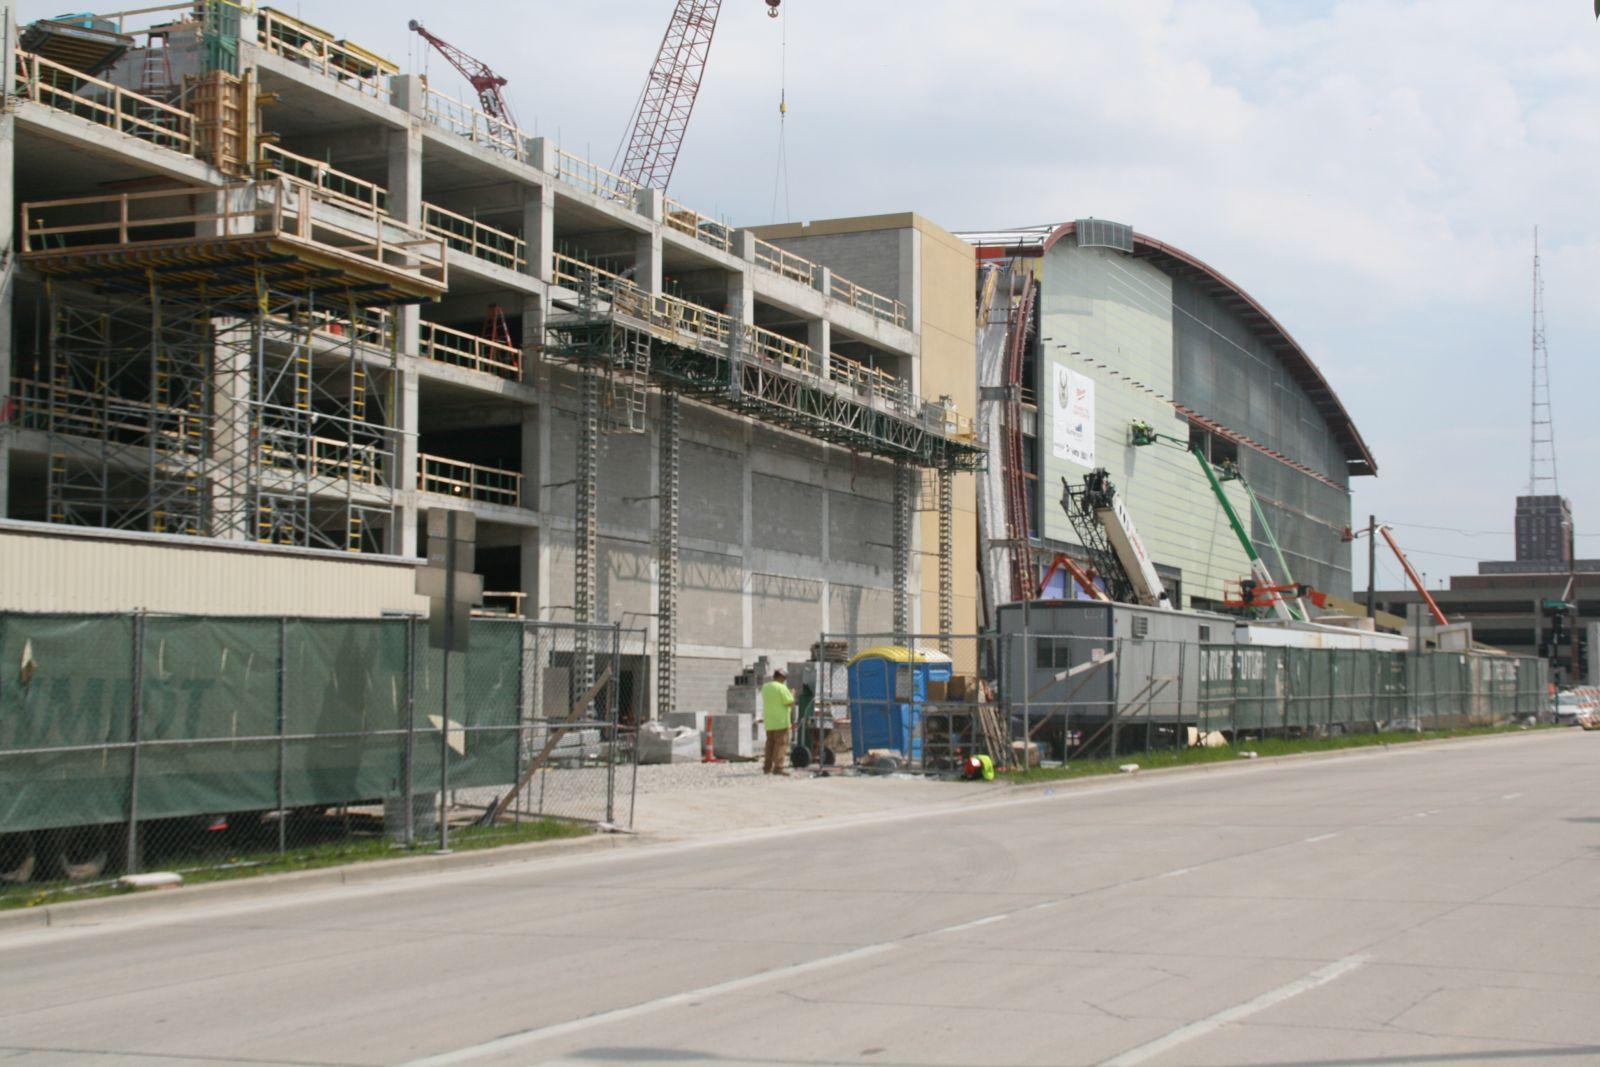 Parking Garage for New Arena